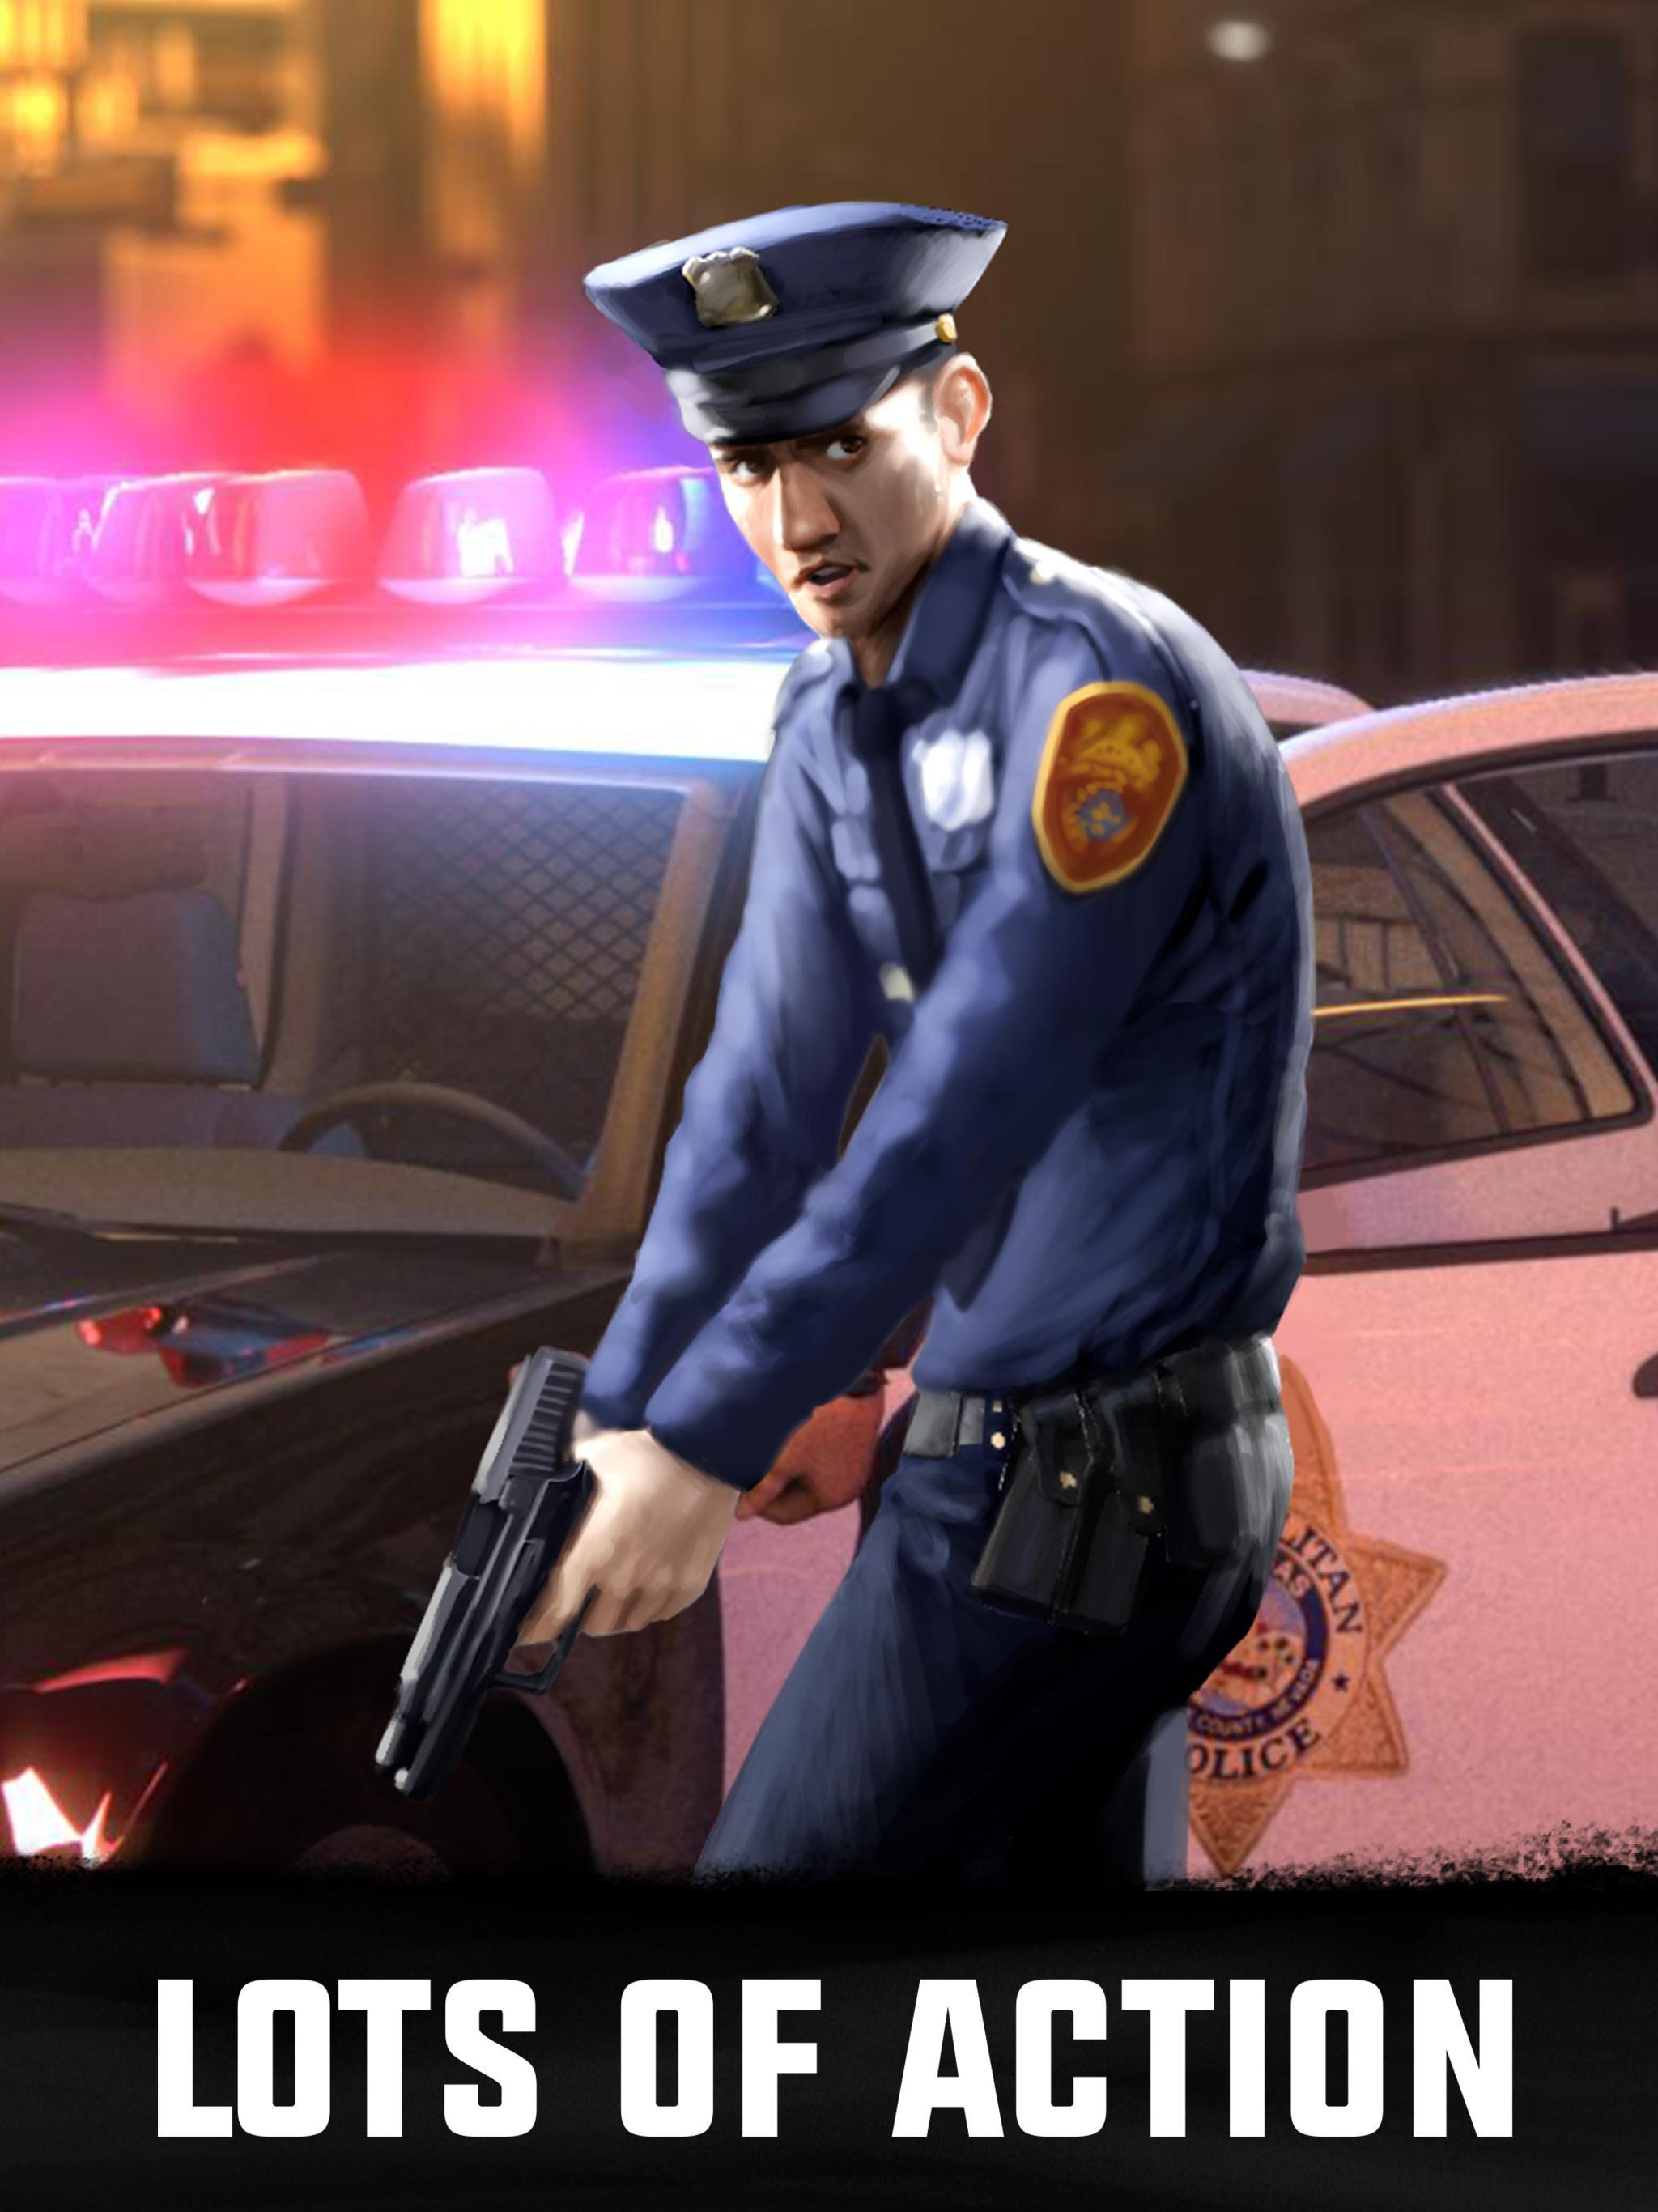 Sniper 3D Fun Free Online FPS Shooting Game 3.15.1 Screenshot 10